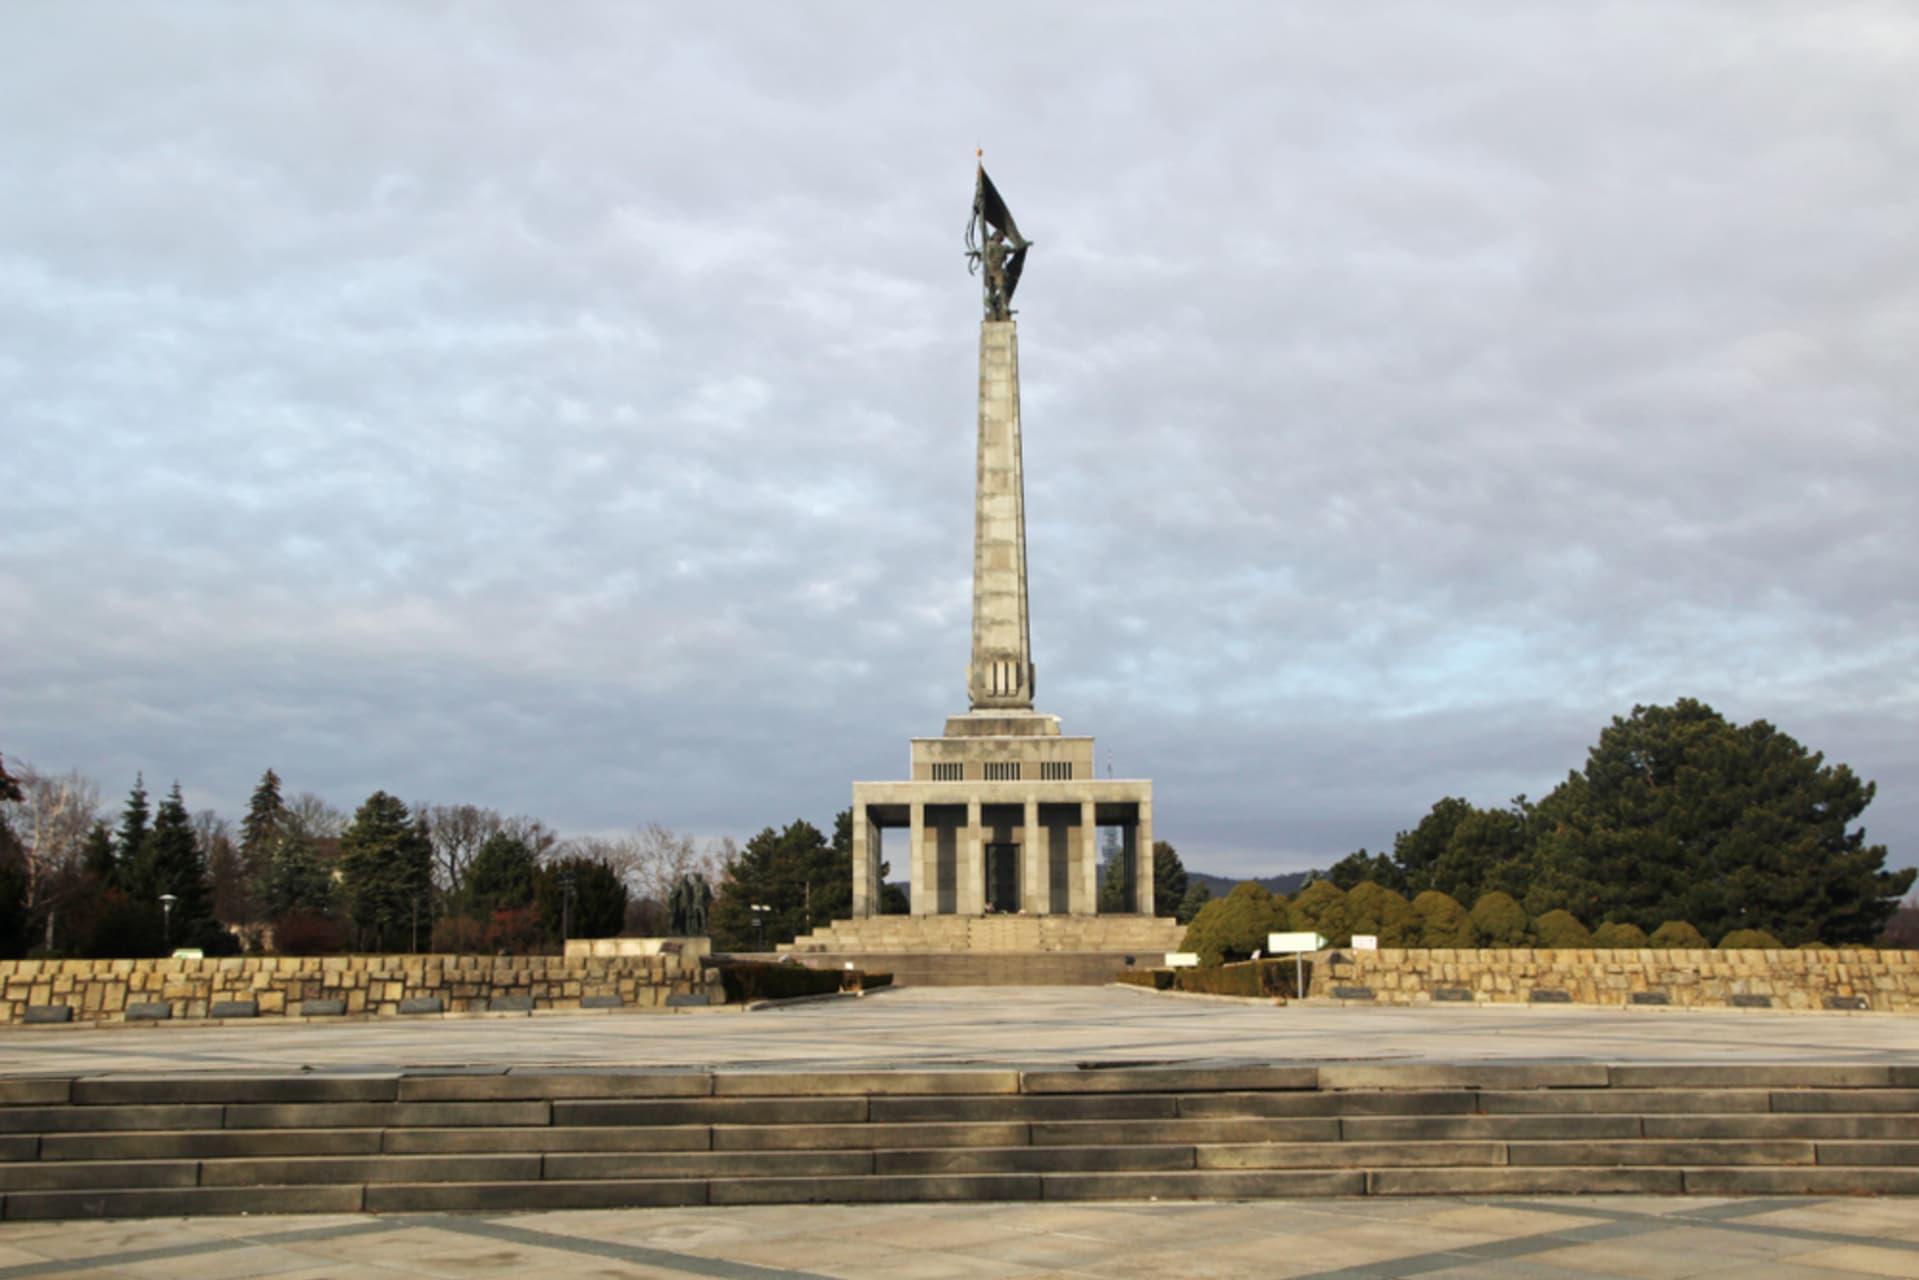 Bratislava - Soviet WWII Memorial and City Views